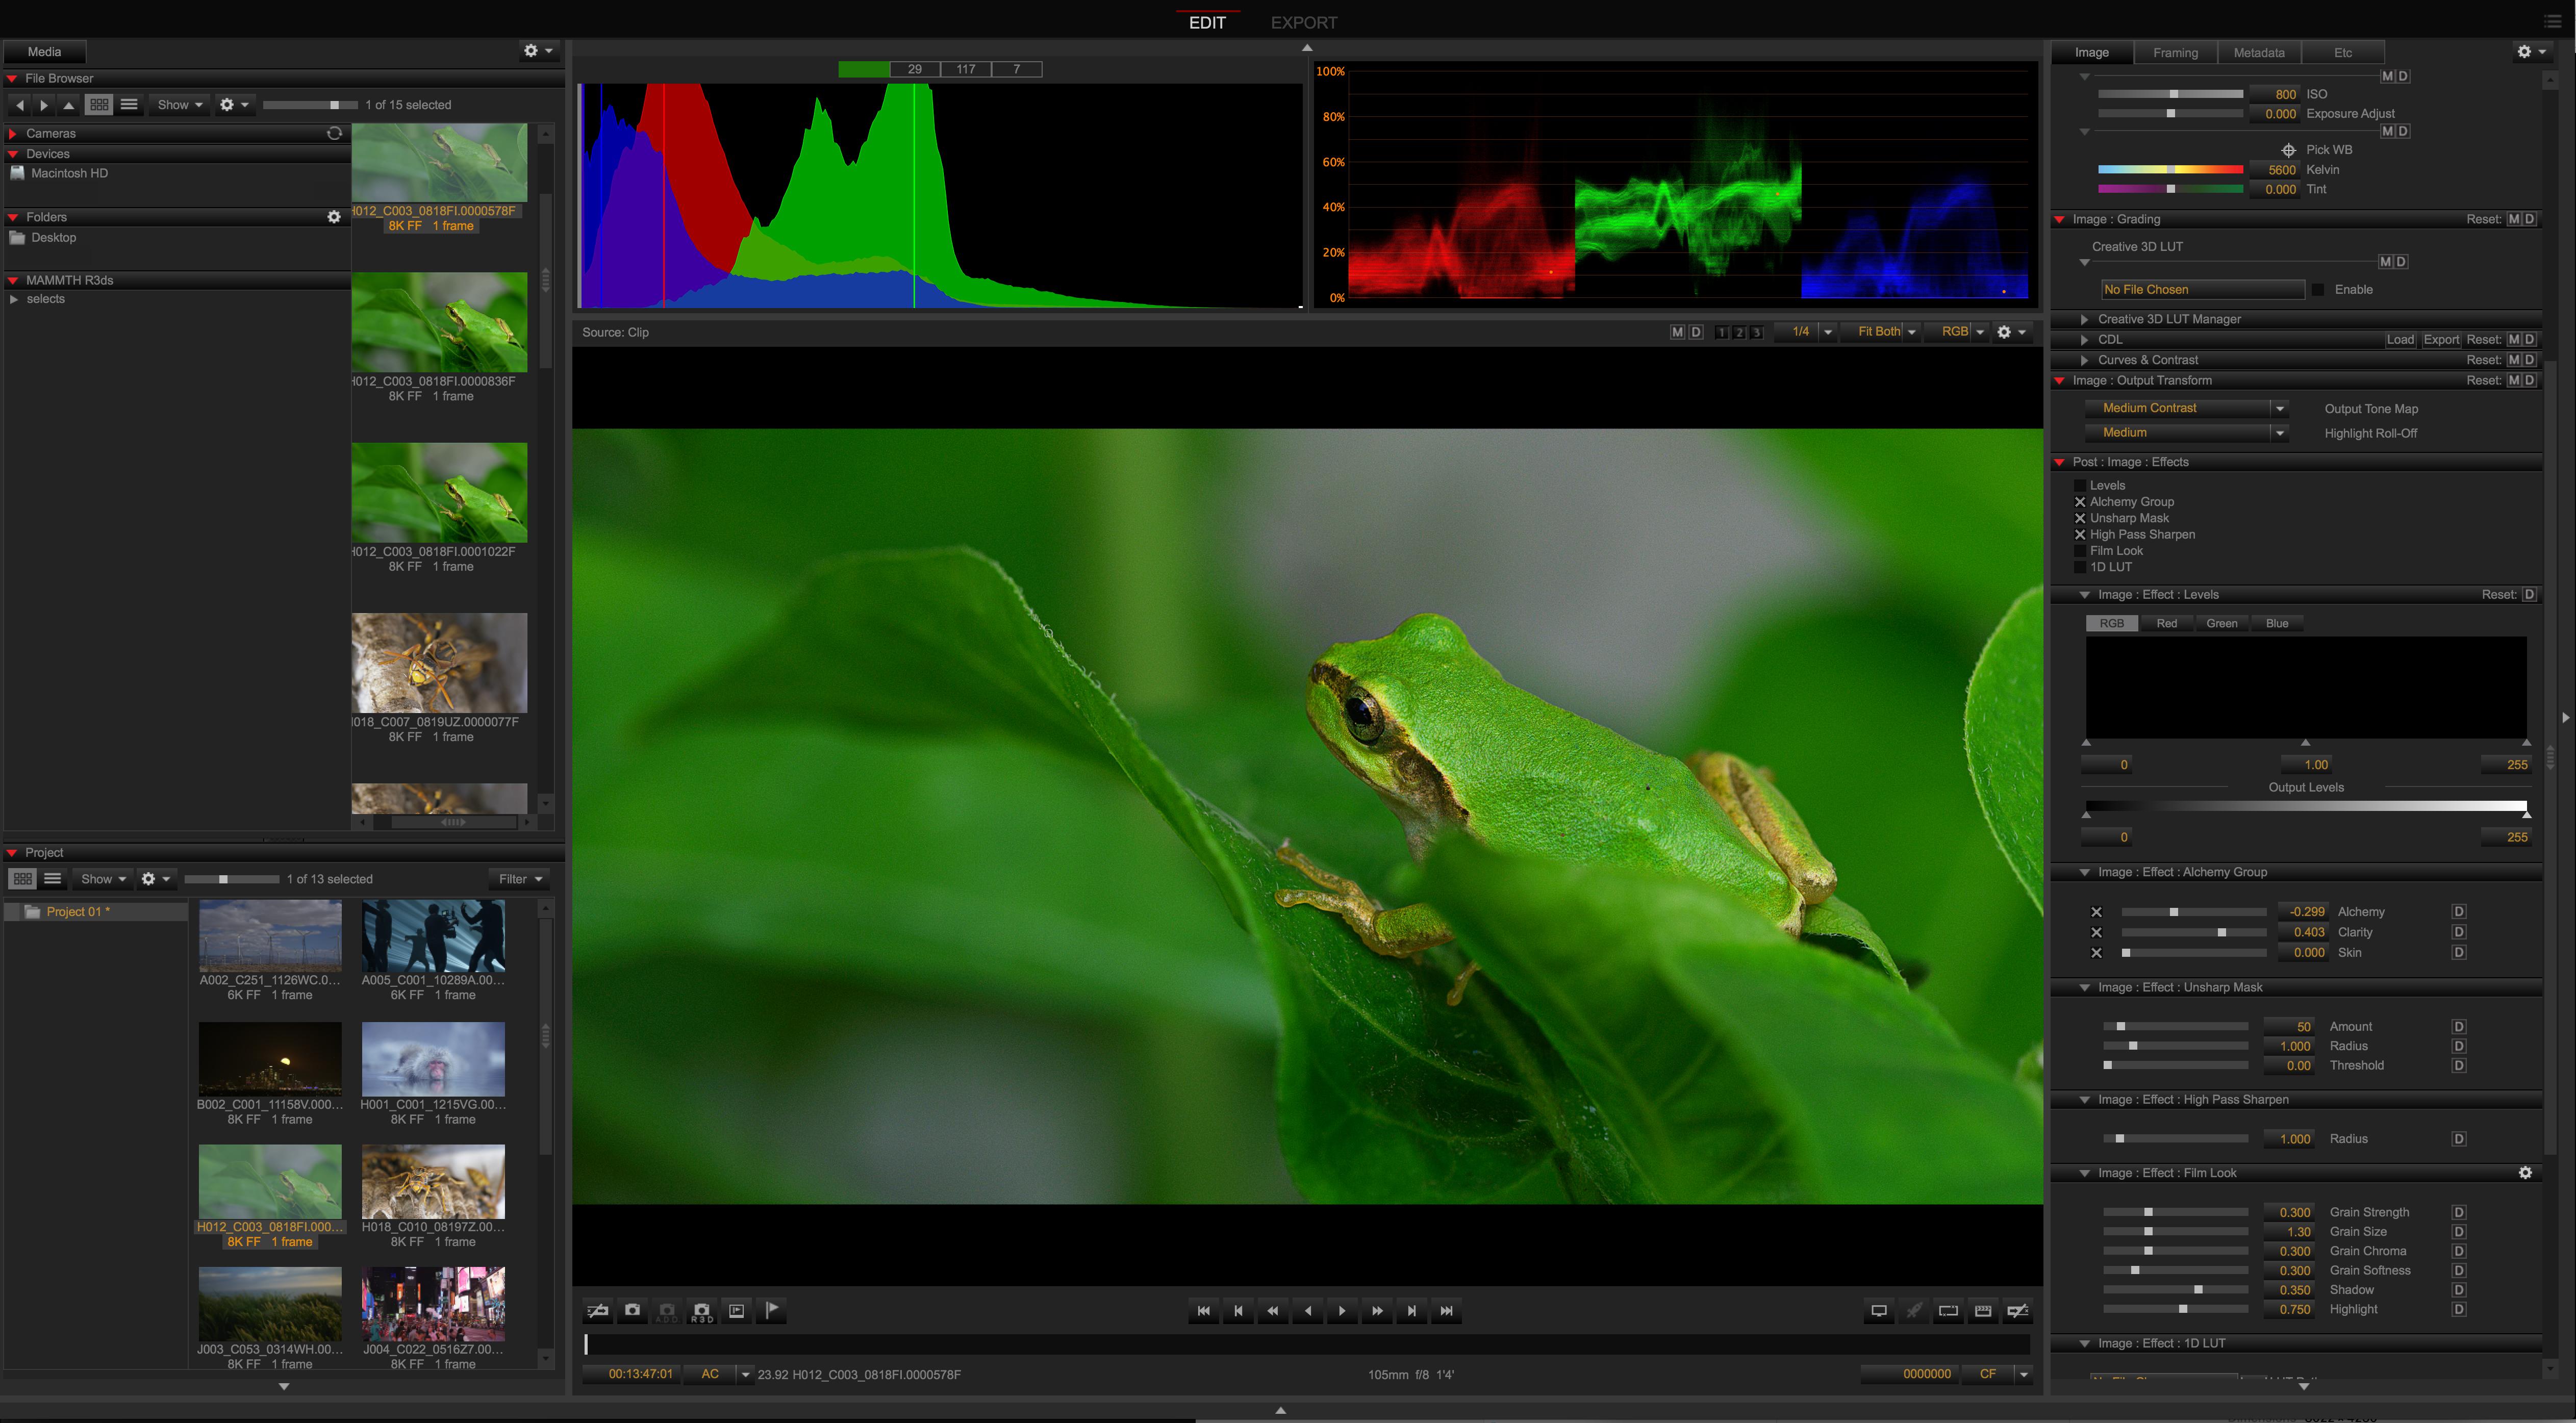 RED | EPIC-W | 8K Professional Digital Cinema Camera